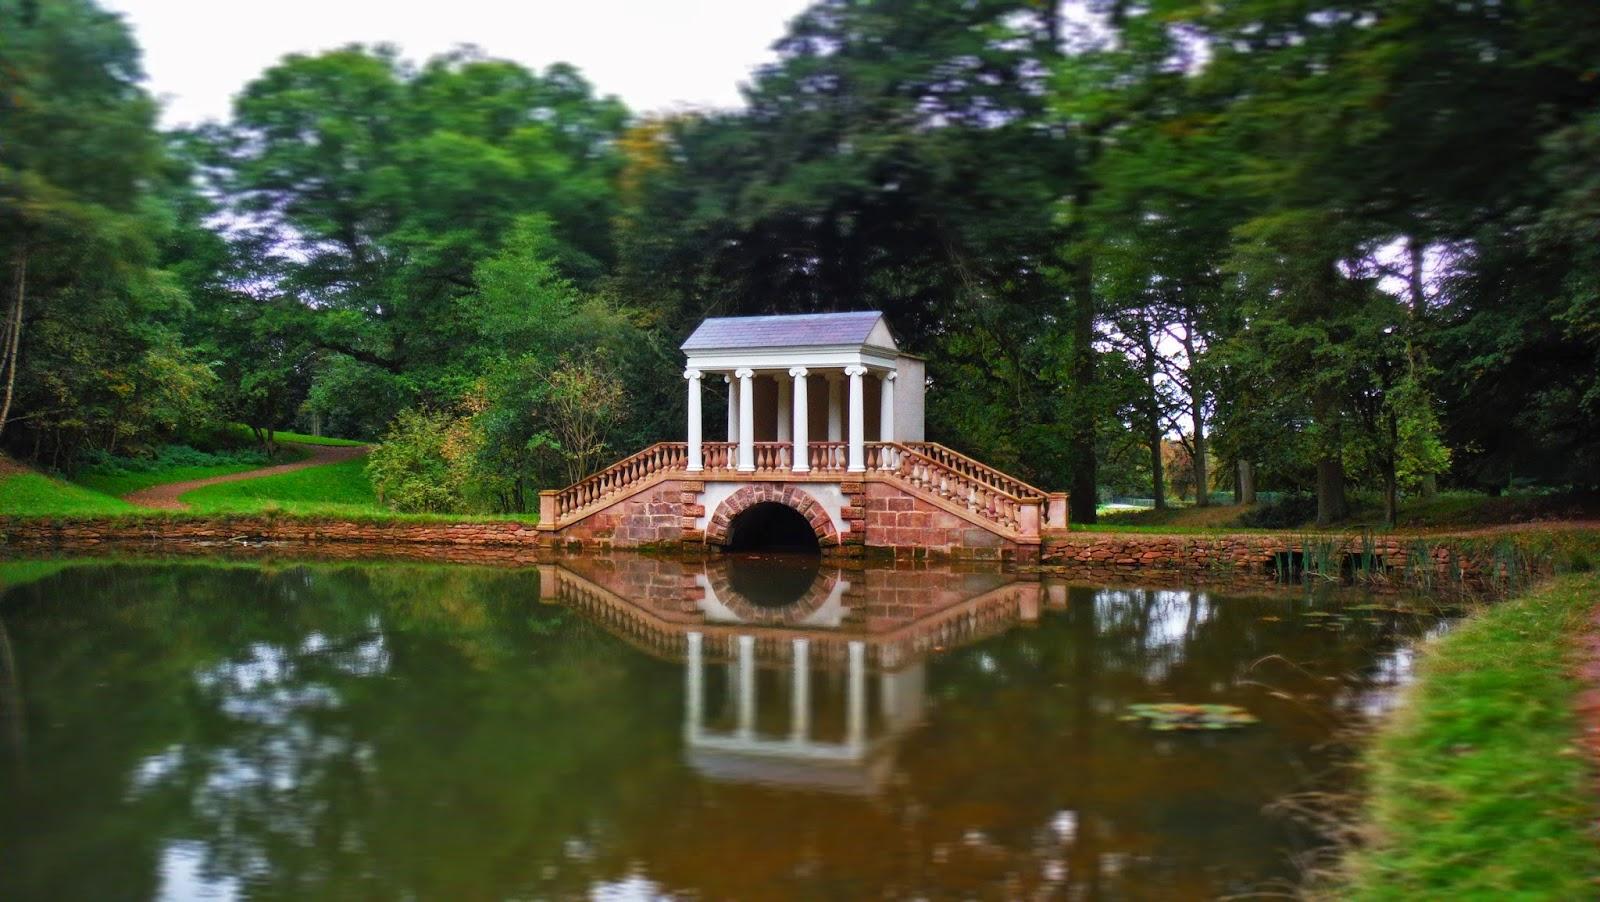 Palladian+Bridge_Hagley+Hall_Georgian+Garden+Building